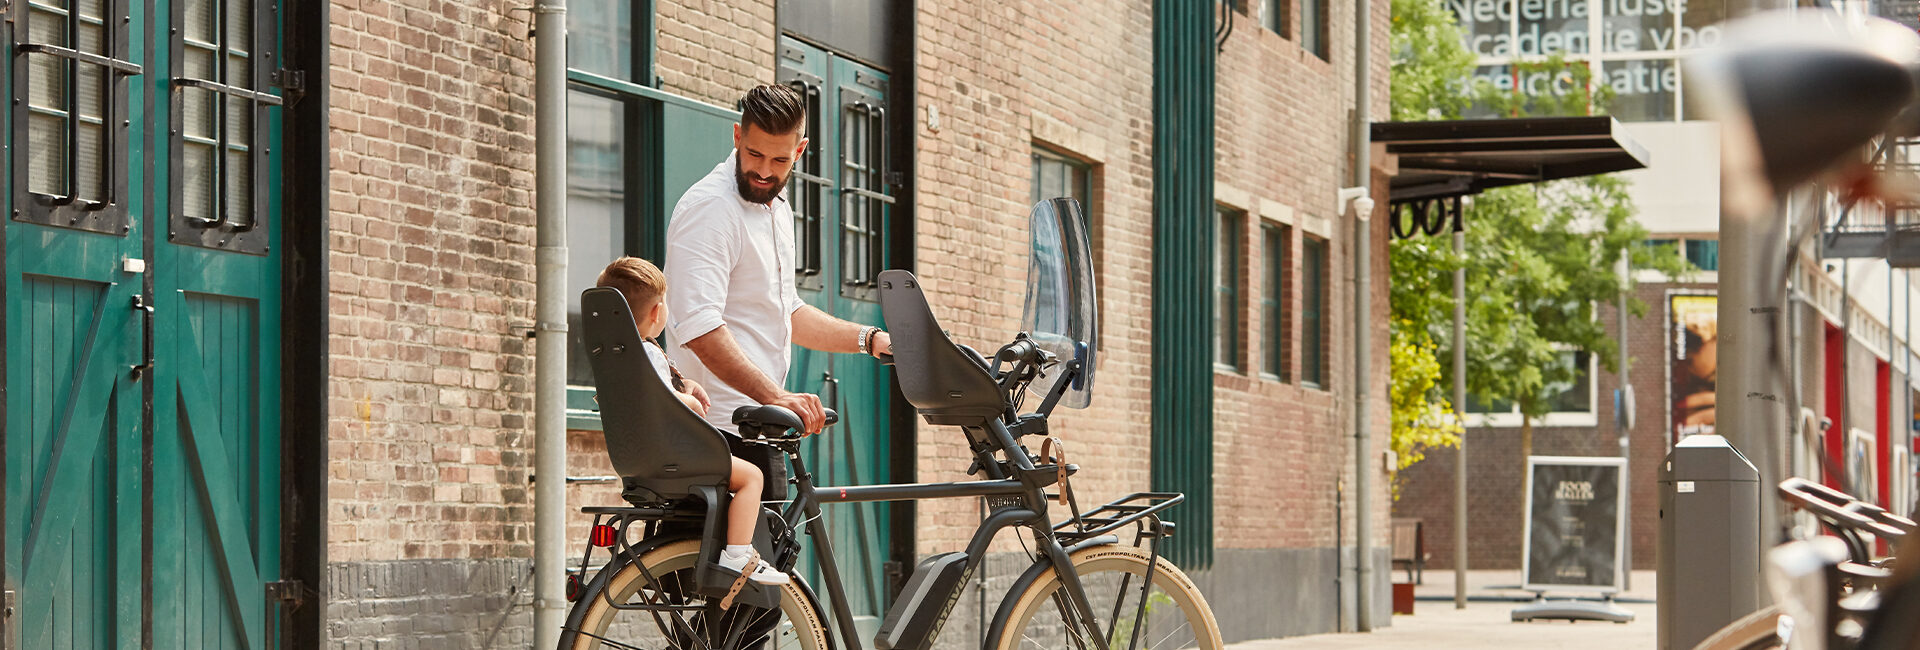 urban-iki-achterzitje-bincho-black-fiets